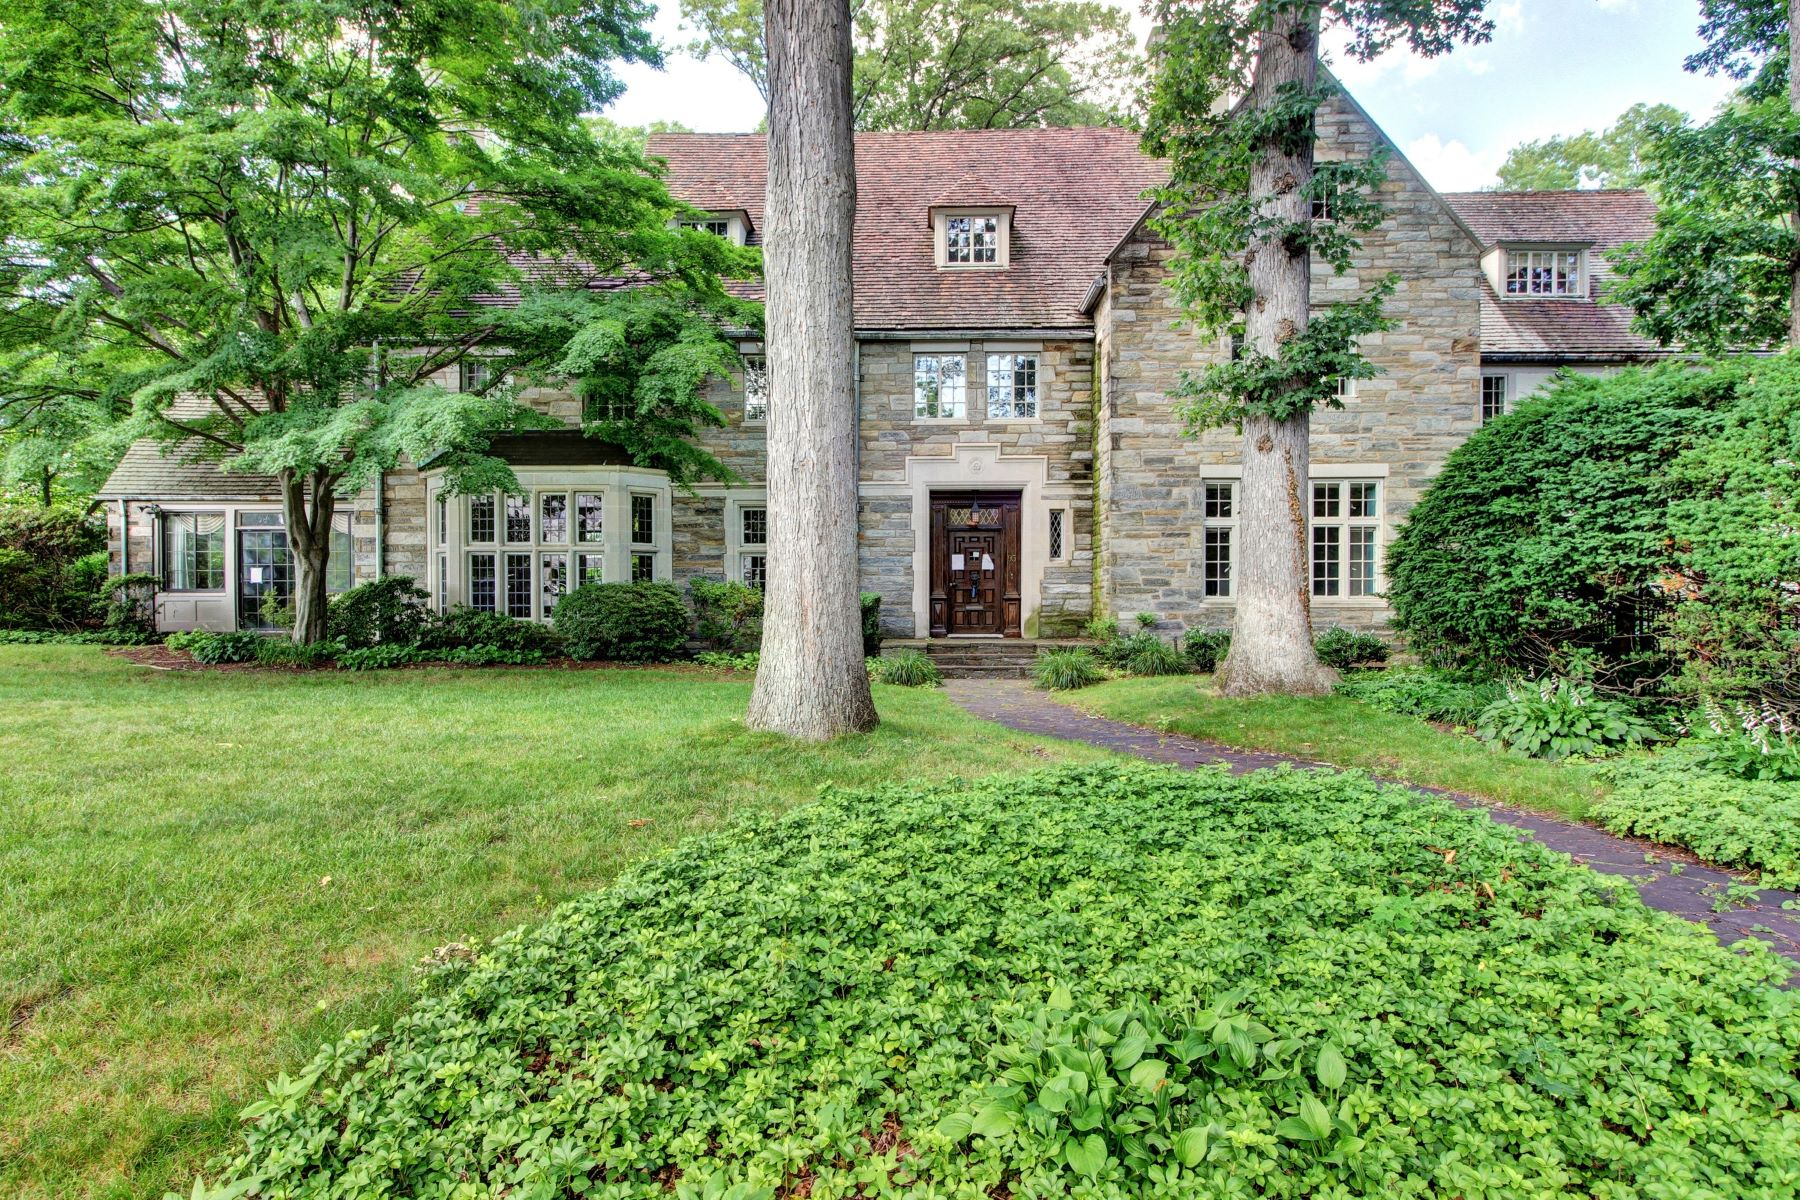 Villa per Vendita alle ore Iconic Pre War Estate 95 Wildwood Rd, Ridgewood, New Jersey 07450 Stati Uniti